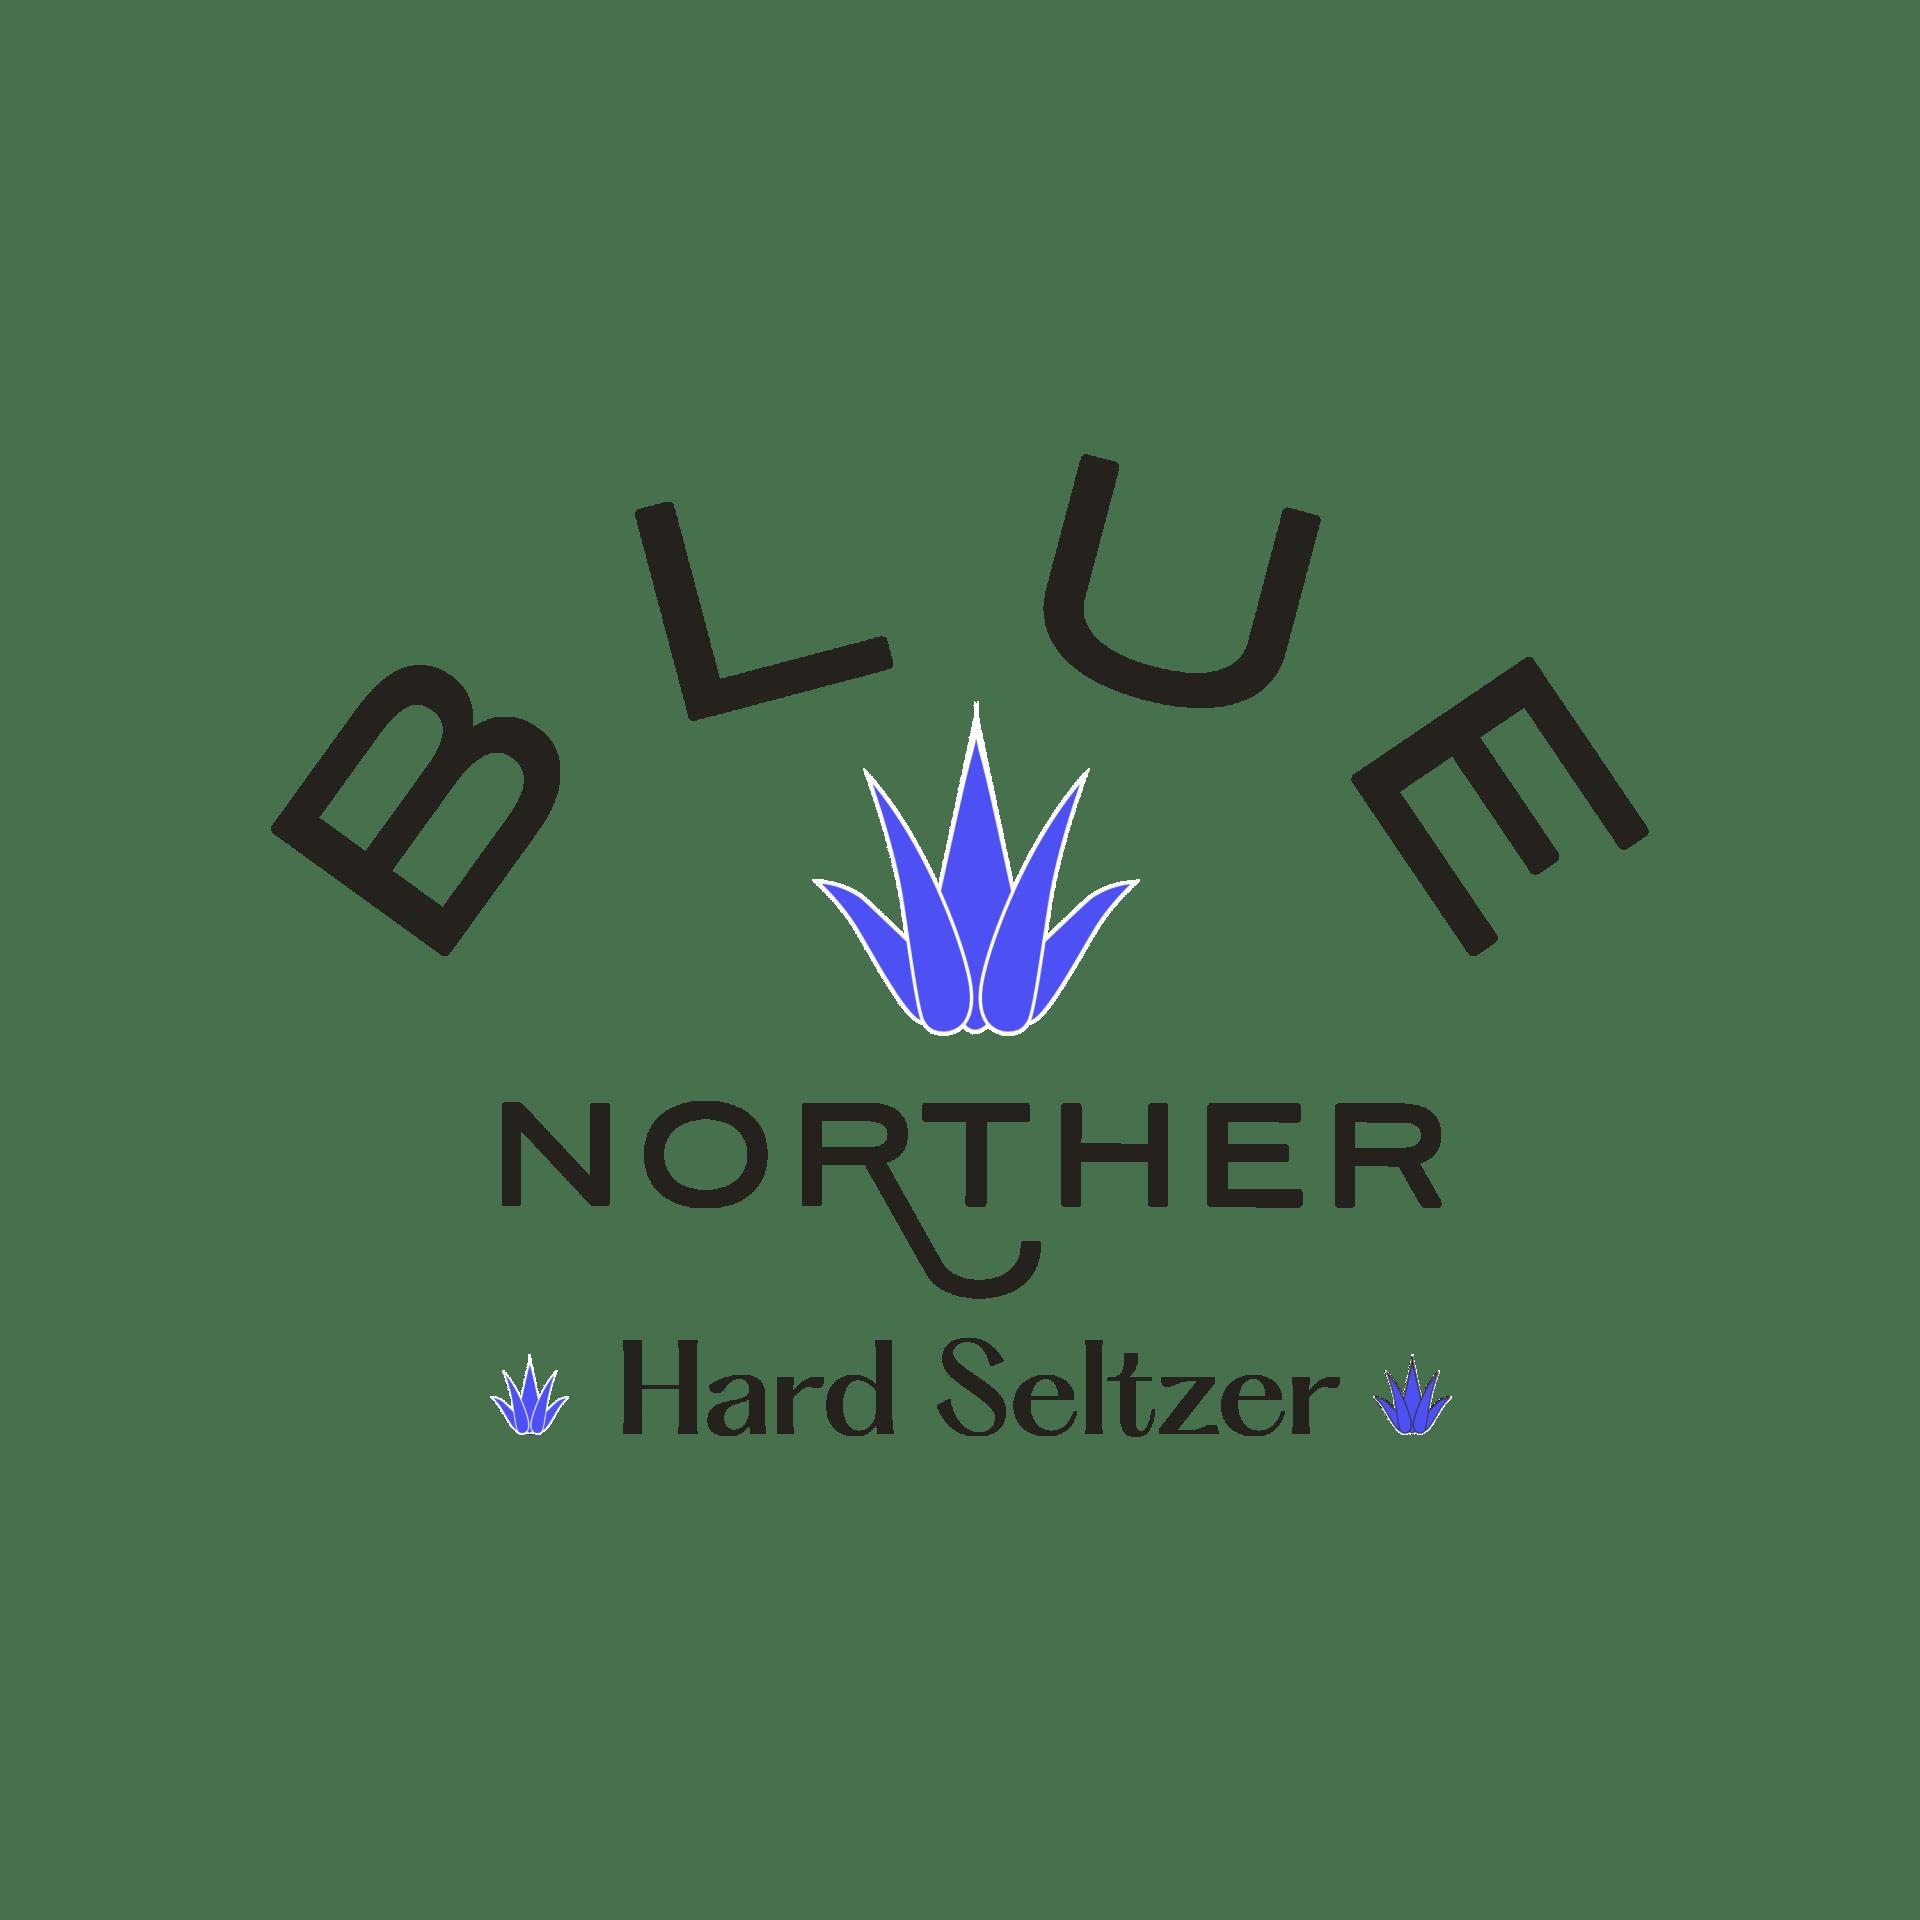 New Blue Norther Hard Seltzer Blasts in to Austin Market